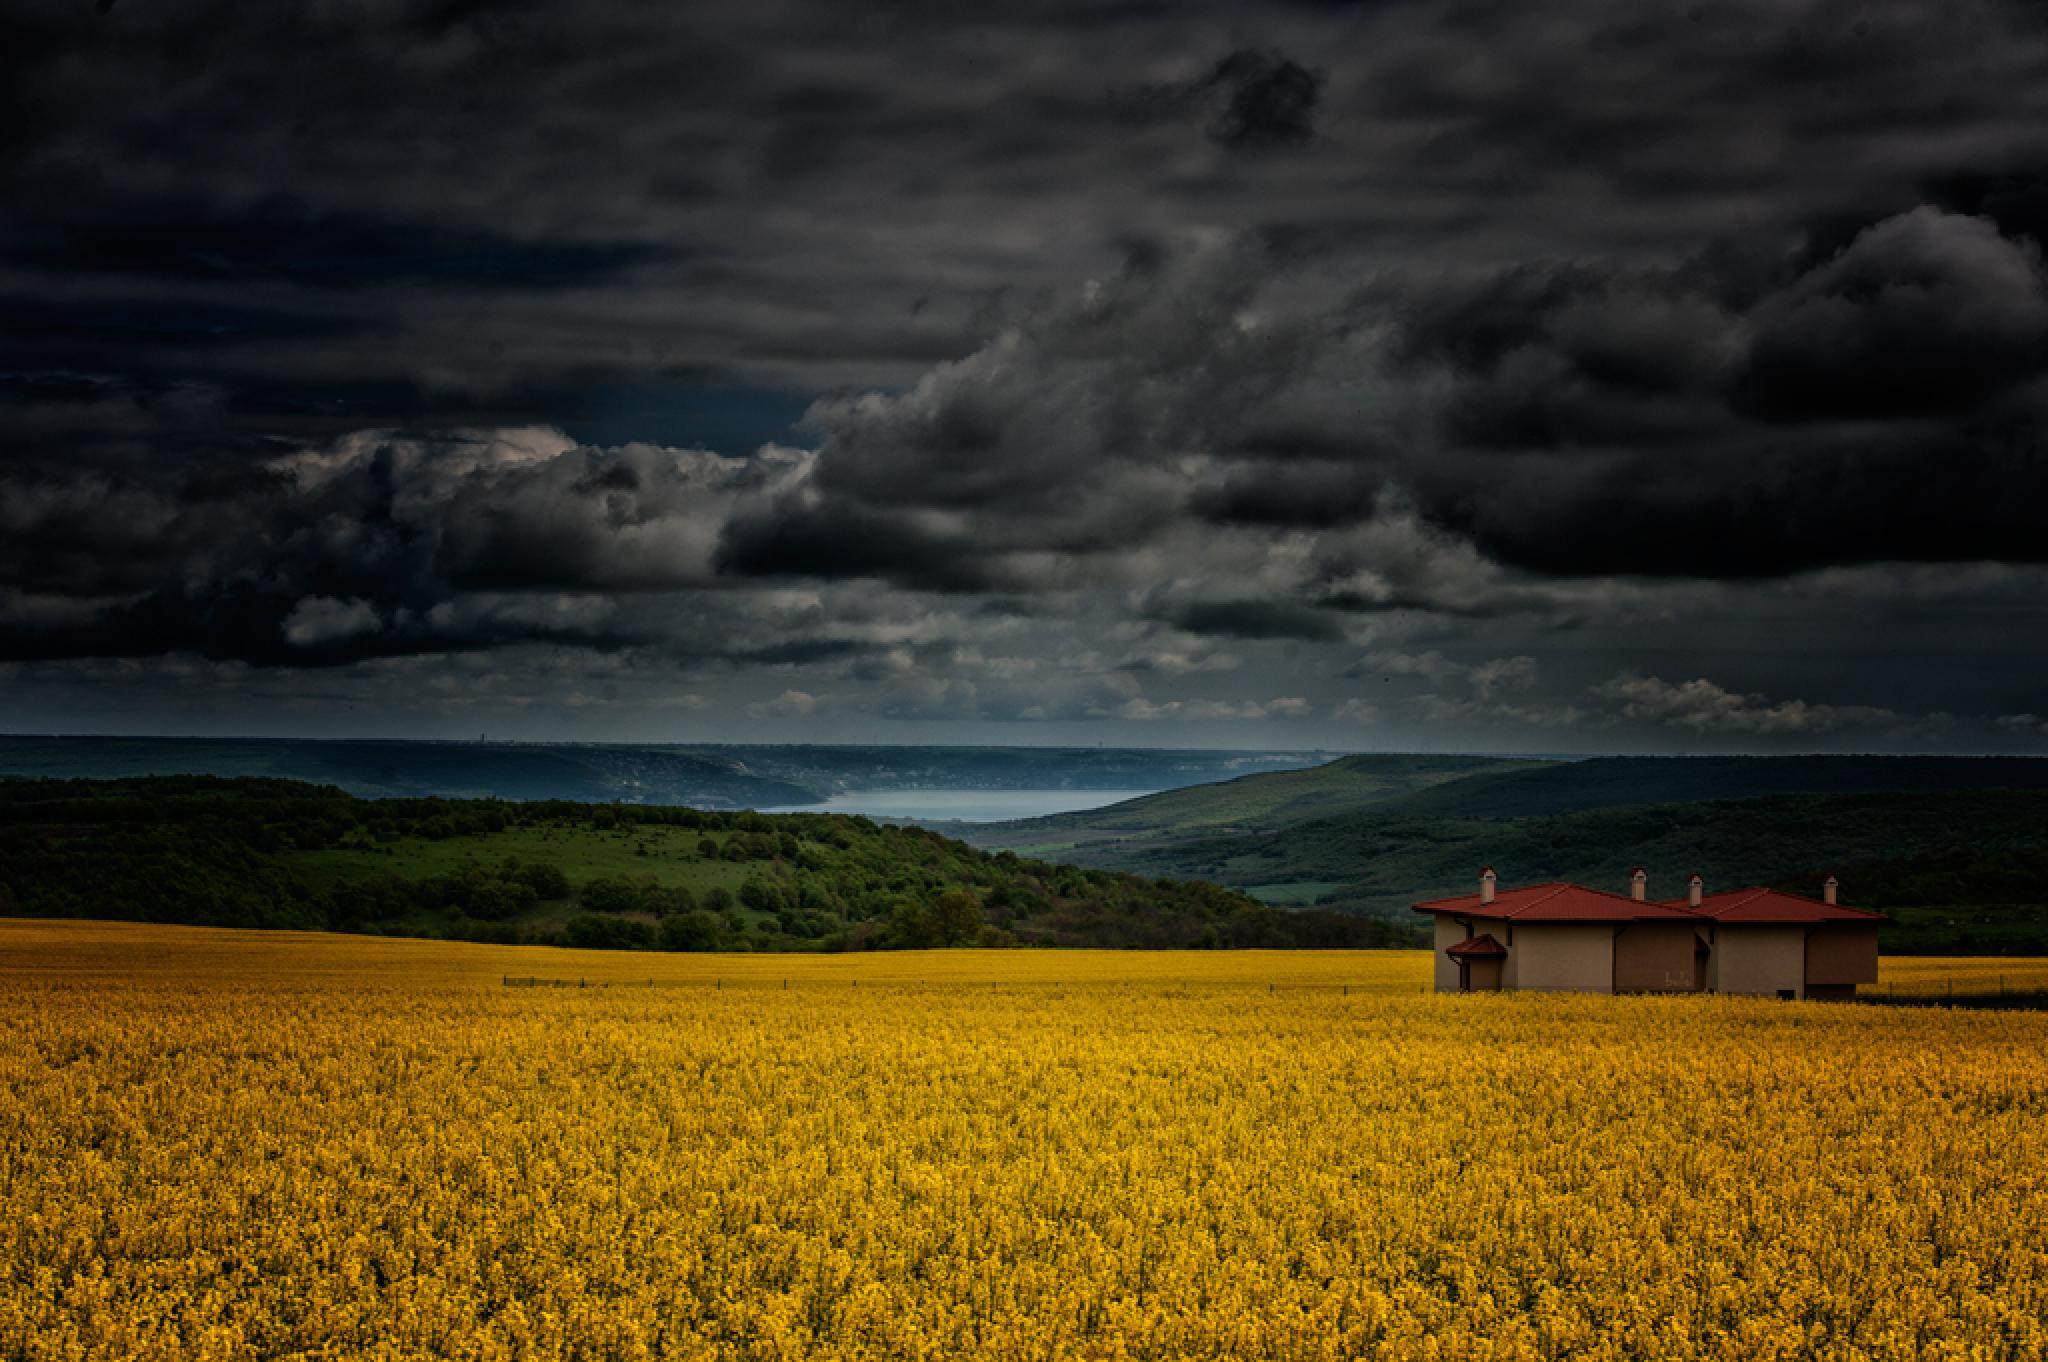 yellow day by lyubomir marinov-bulo